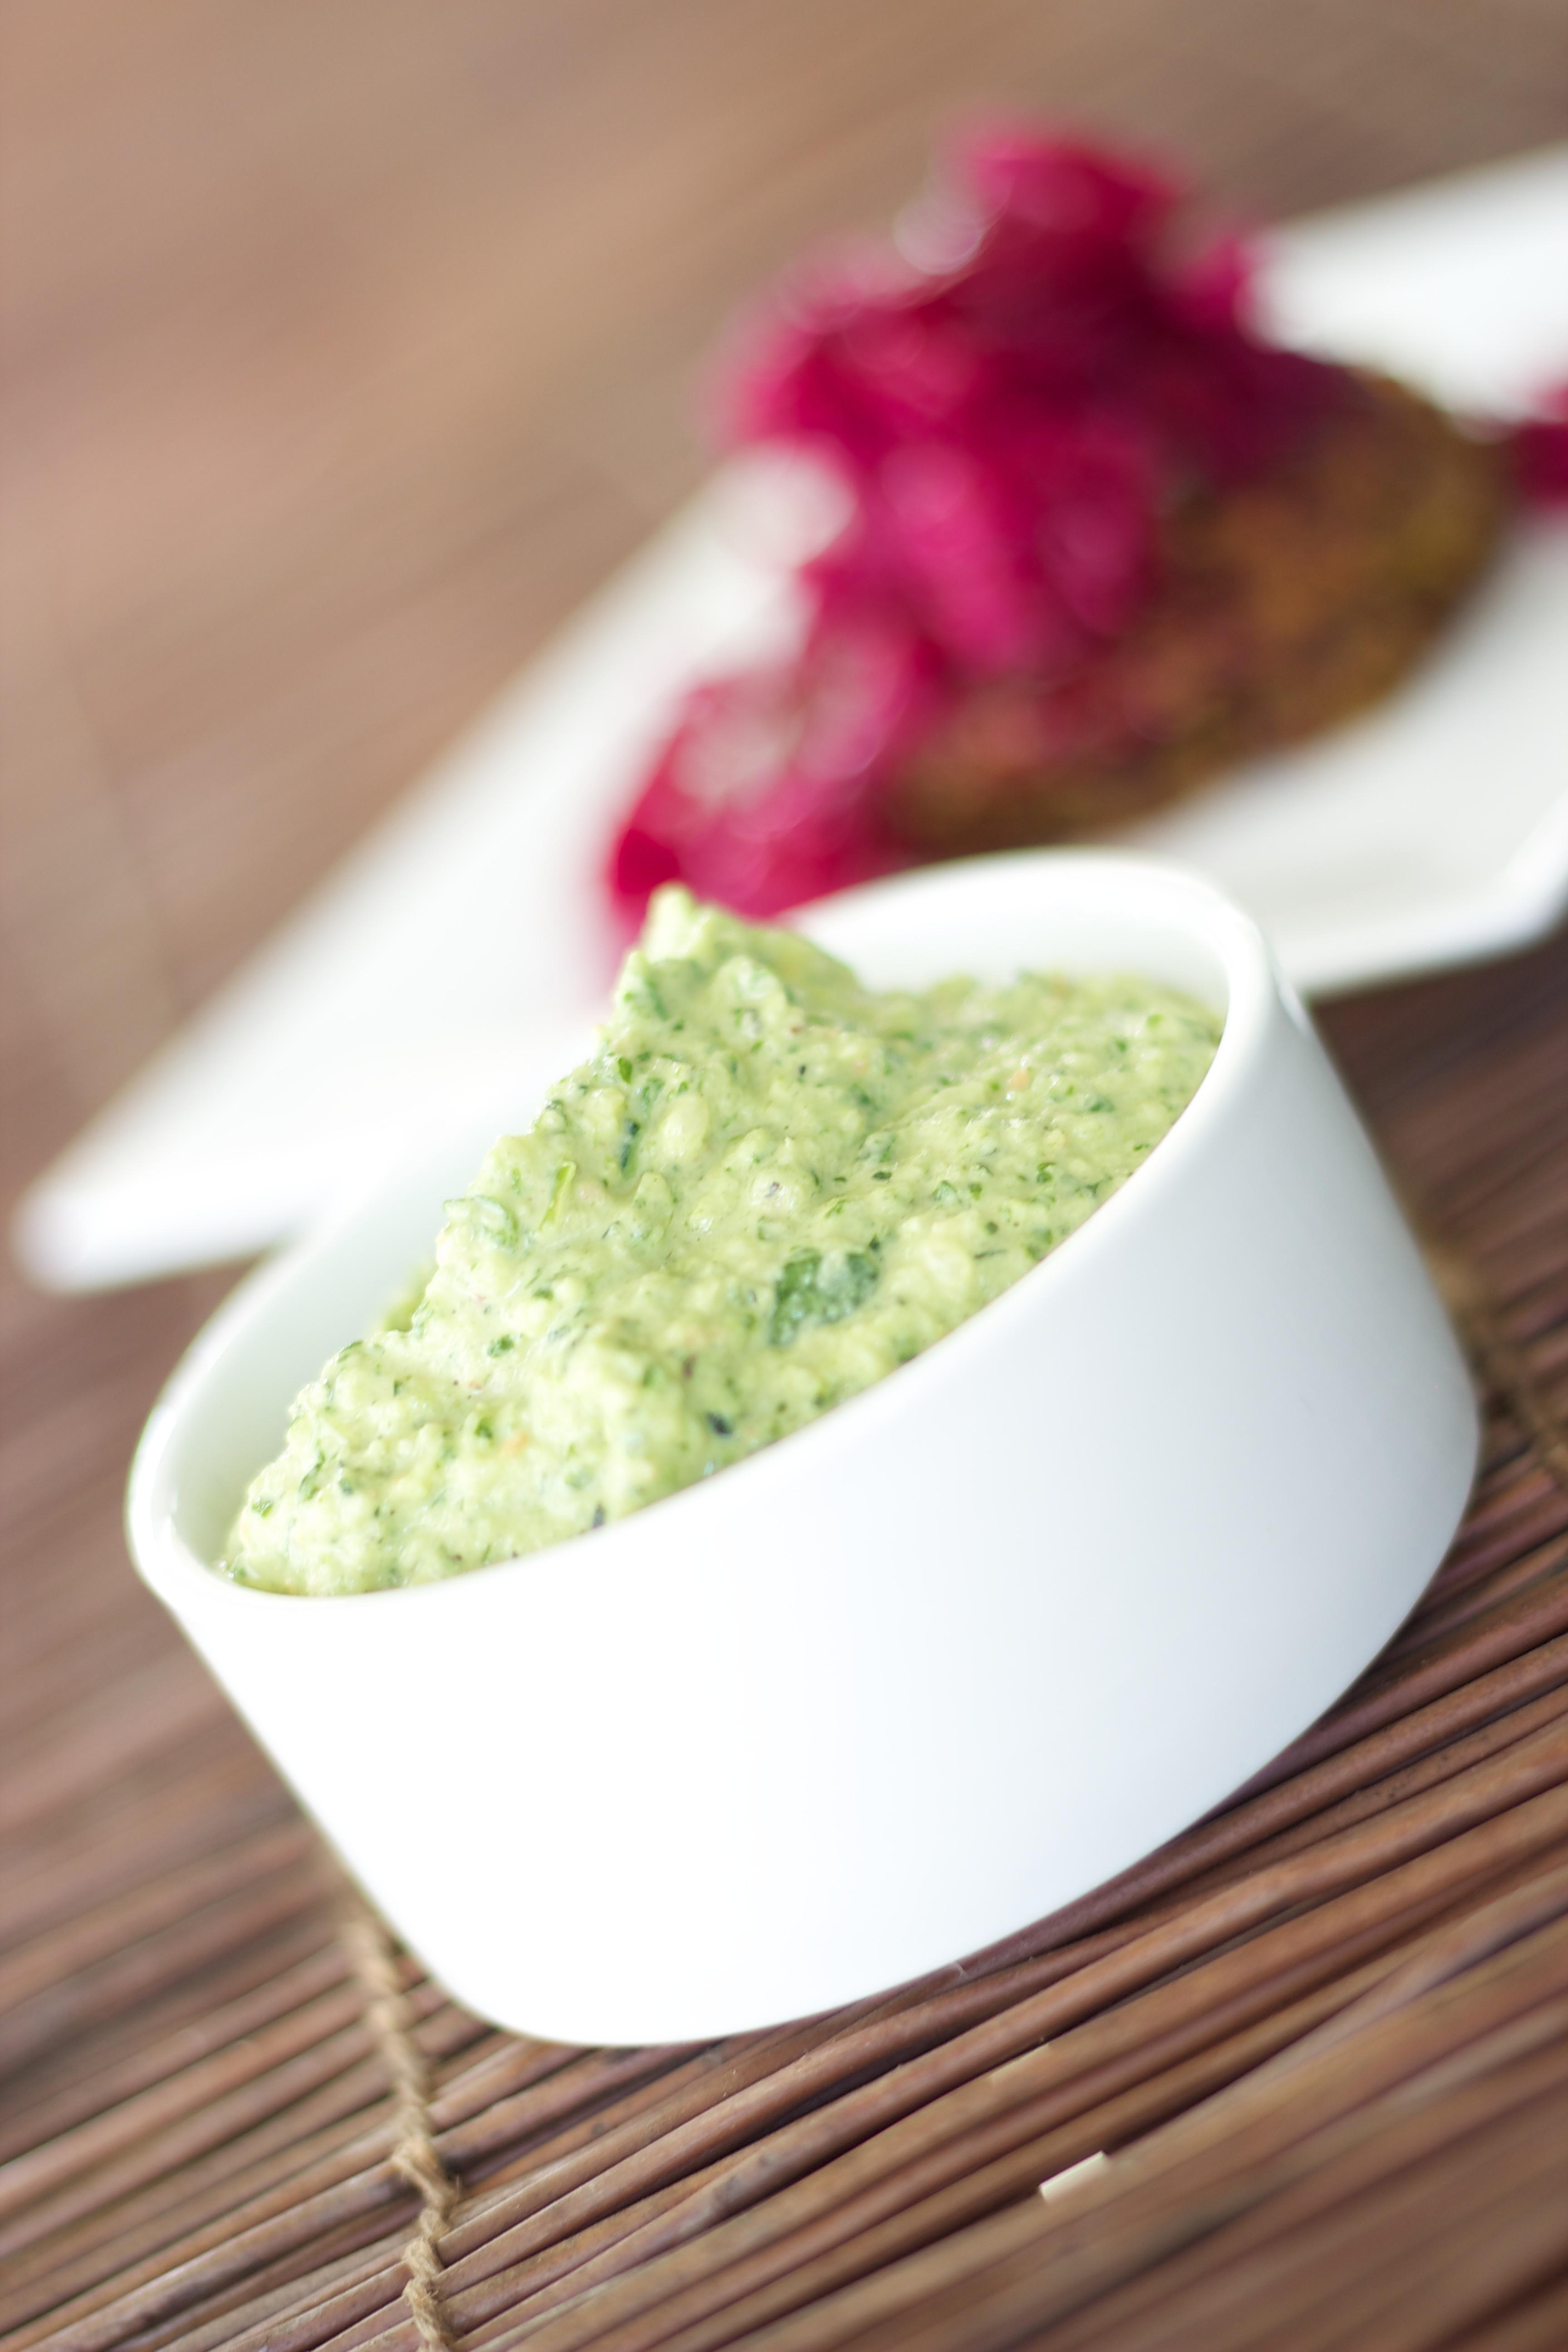 Paleo Spinach Hummus